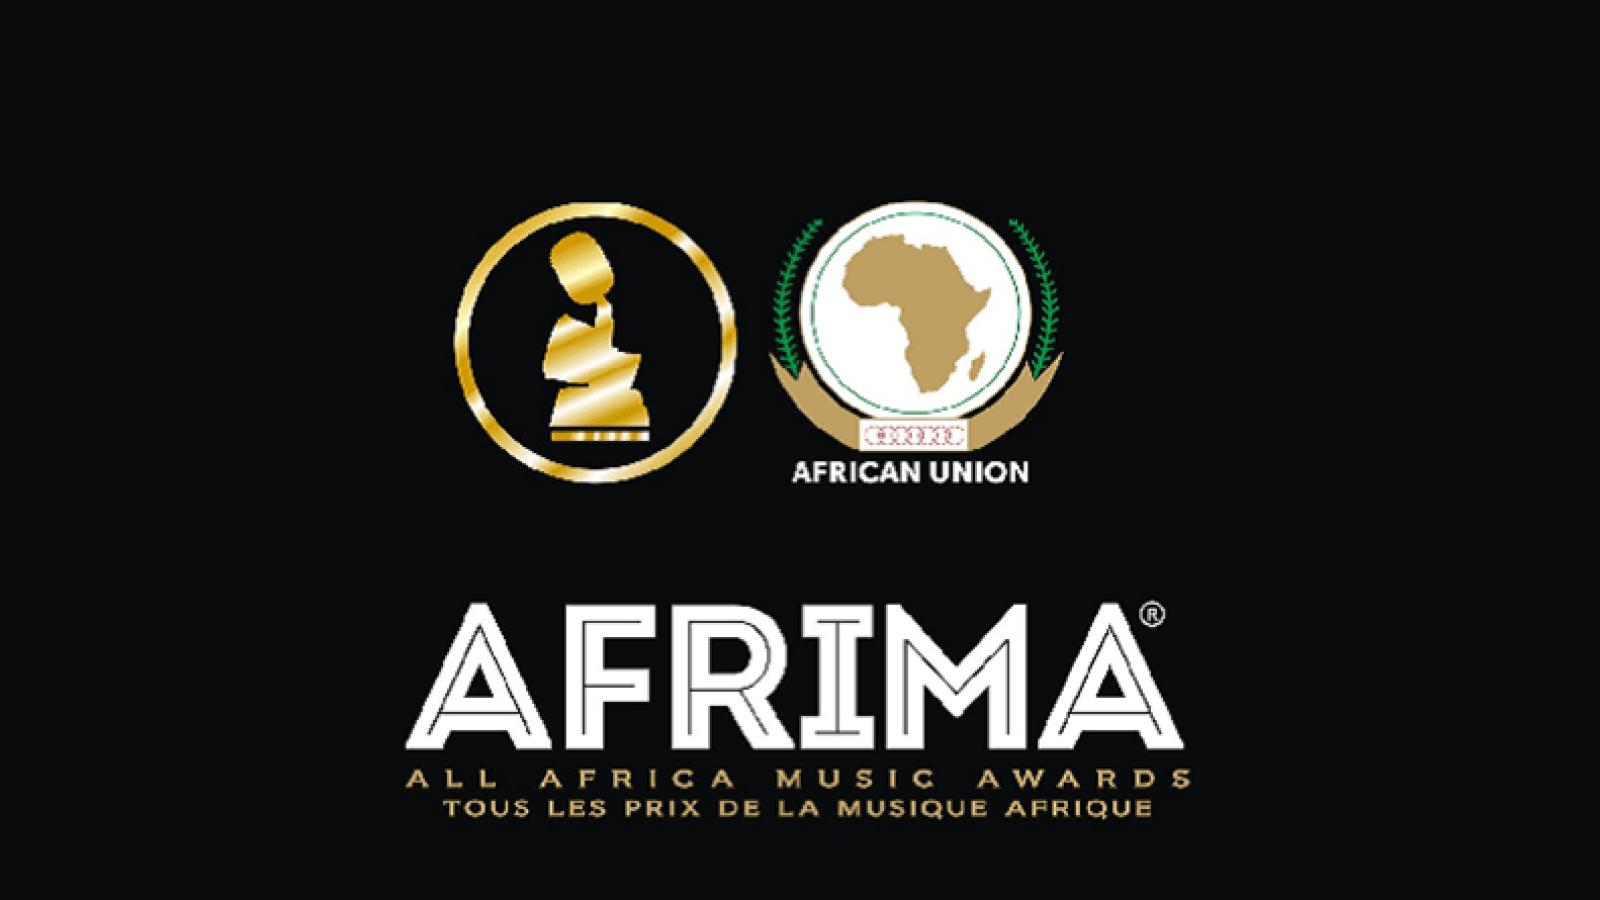 AFRIMA Appoints New Judges Ahead of 2017 Adjudication